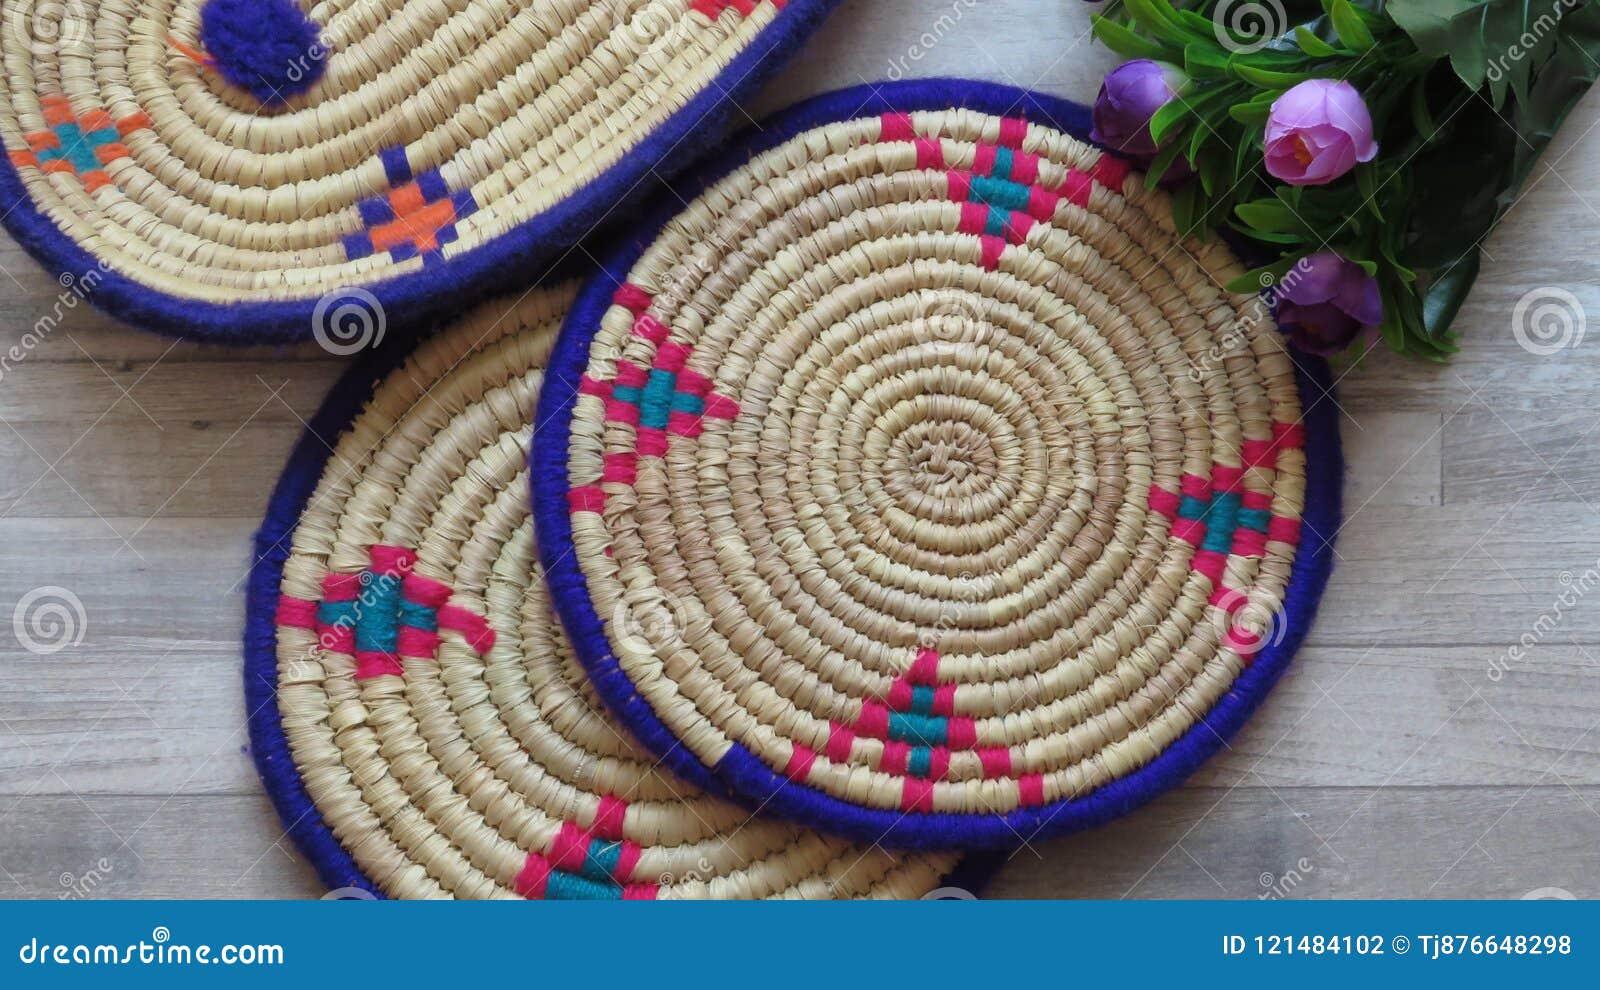 Bambú/Cane Trays tejidos hechos a mano hermosos